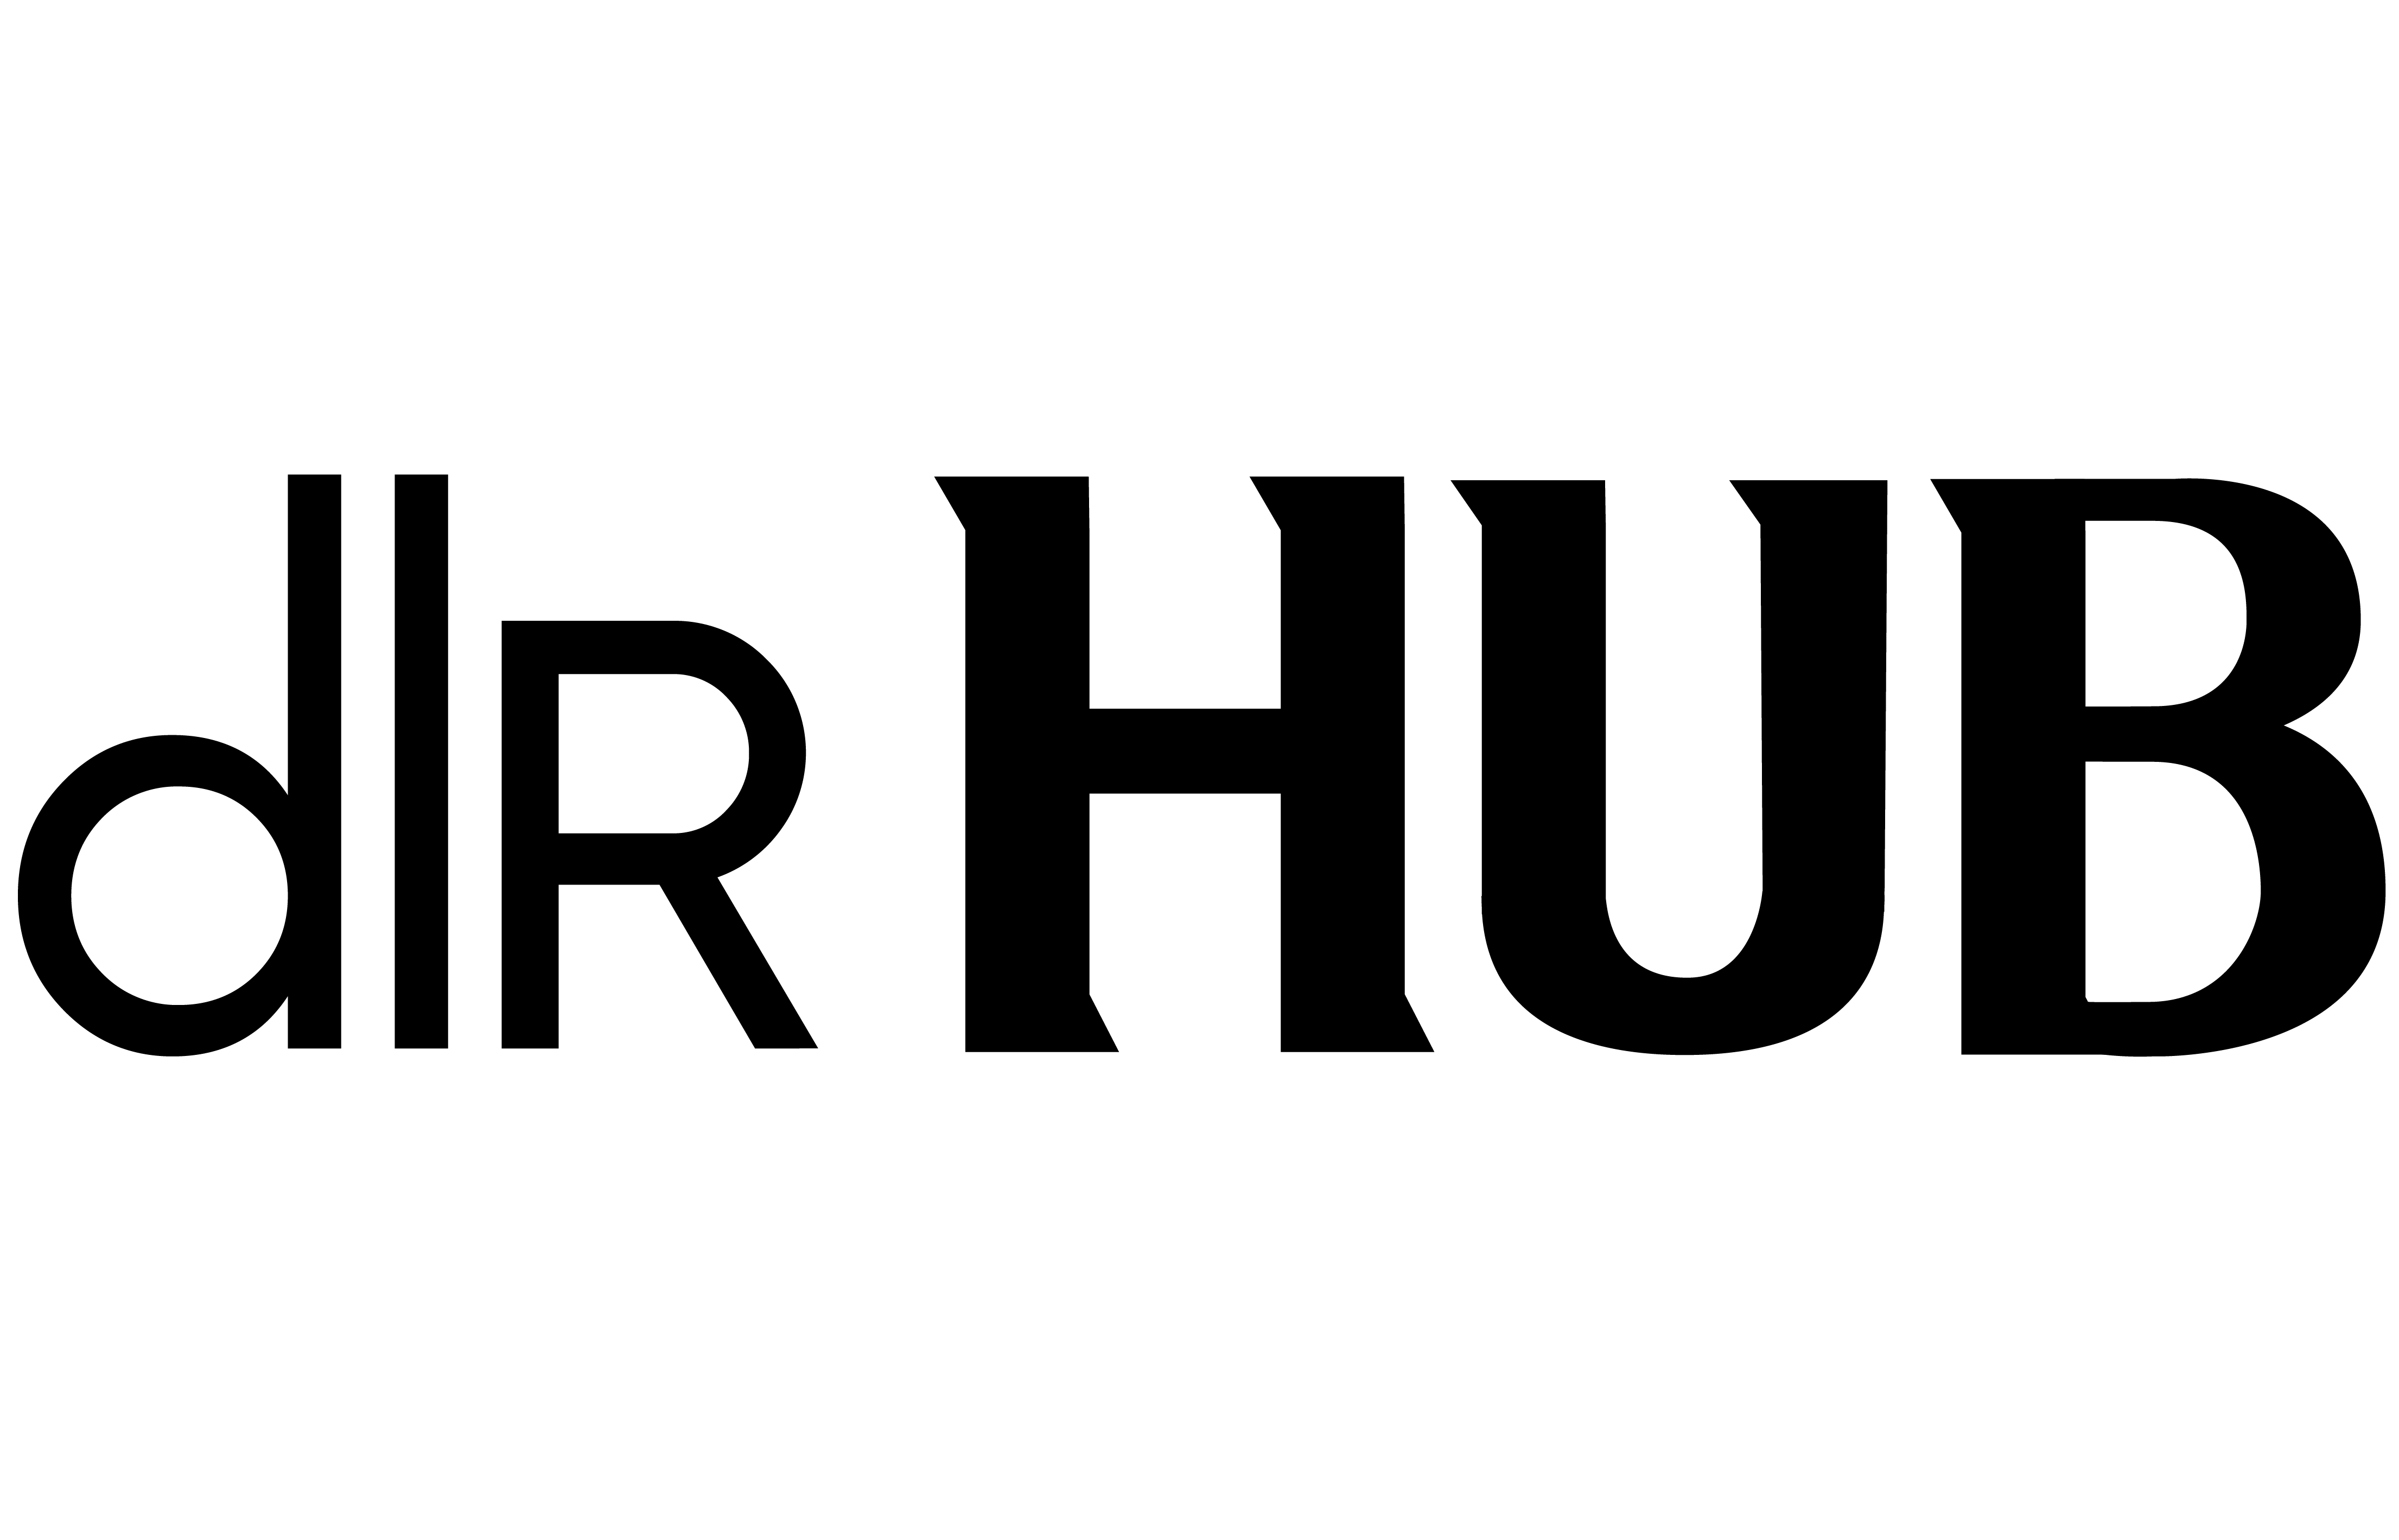 logo-CUALITATIVO ESENCIAL